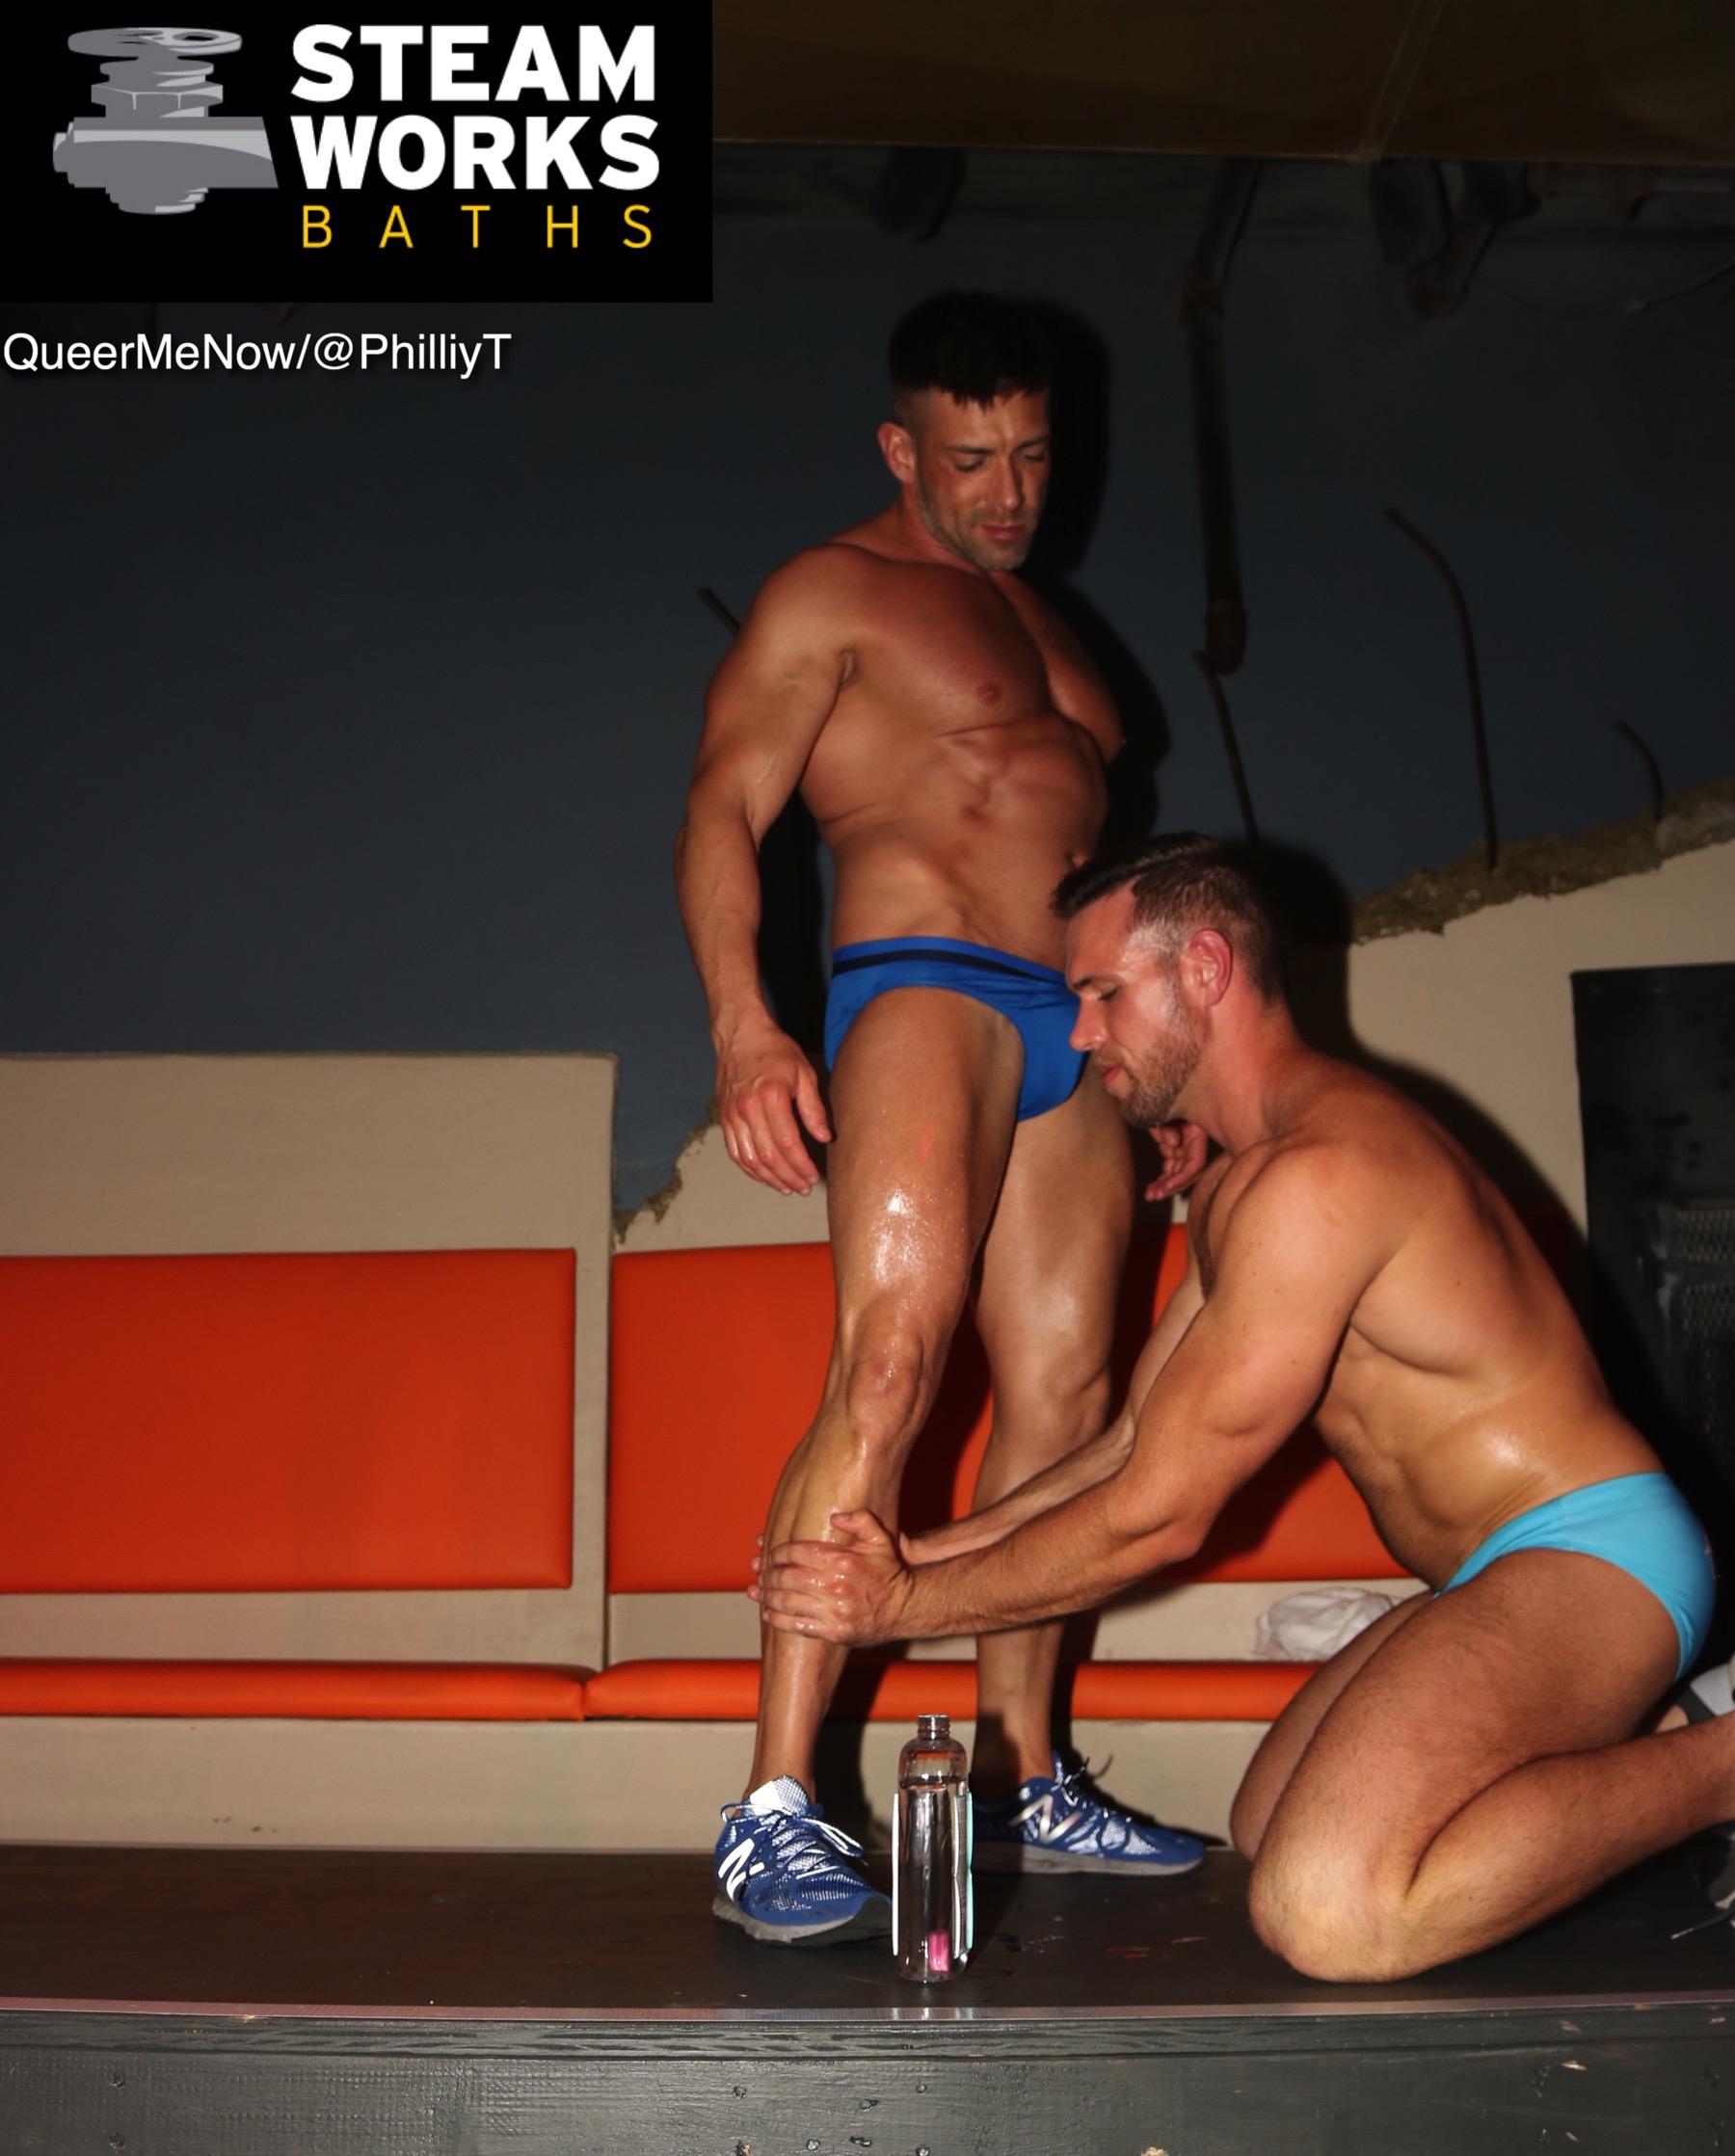 james big brother gay porn